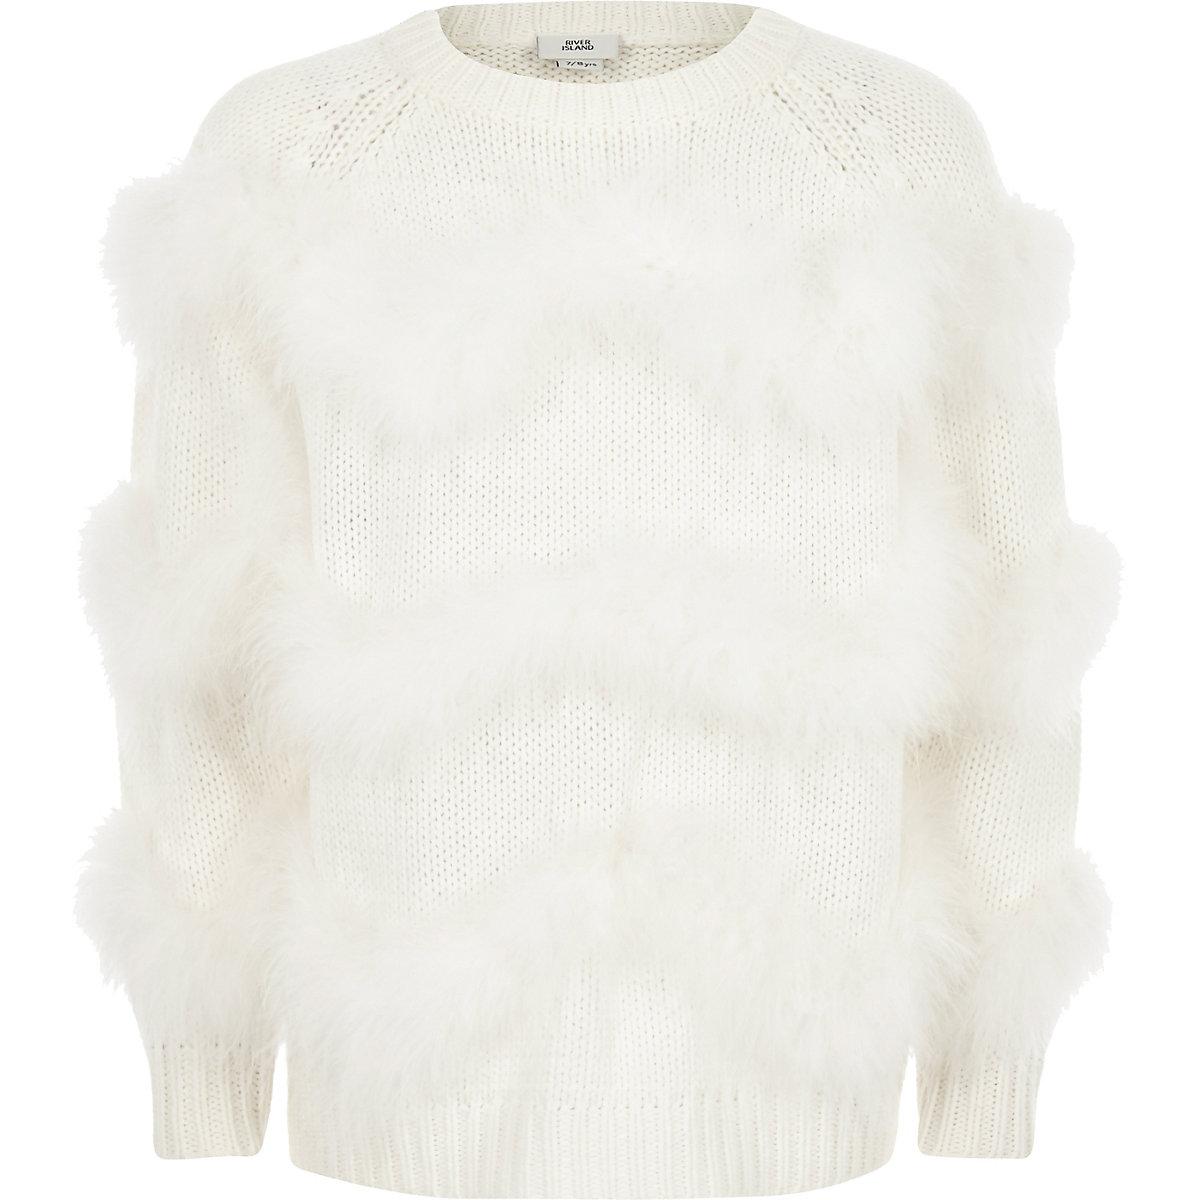 4ec781177 Girls cream marabou faux fur chevron jumper - Cardigans   Jumpers ...